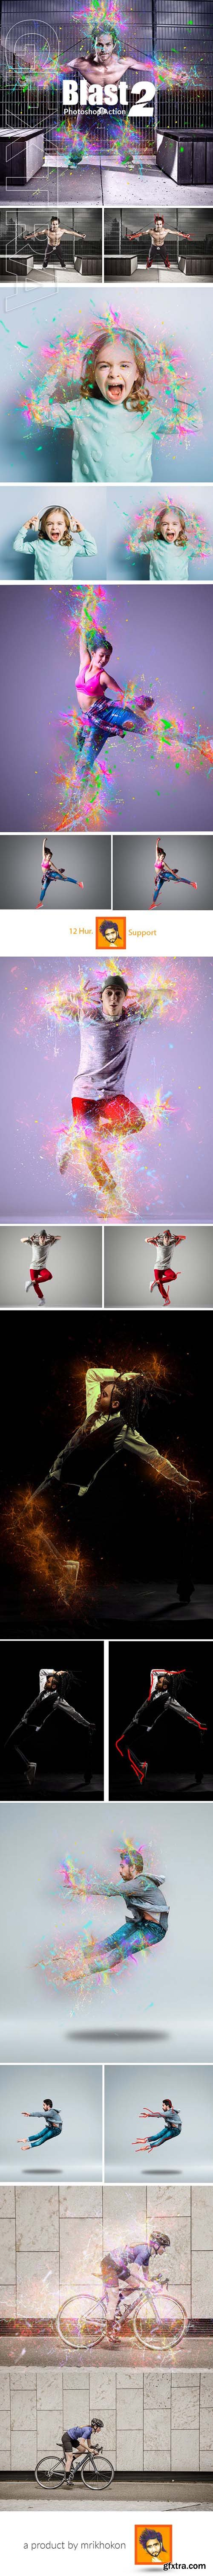 GraphicRiver - Blast Photoshop Action 2 23510806